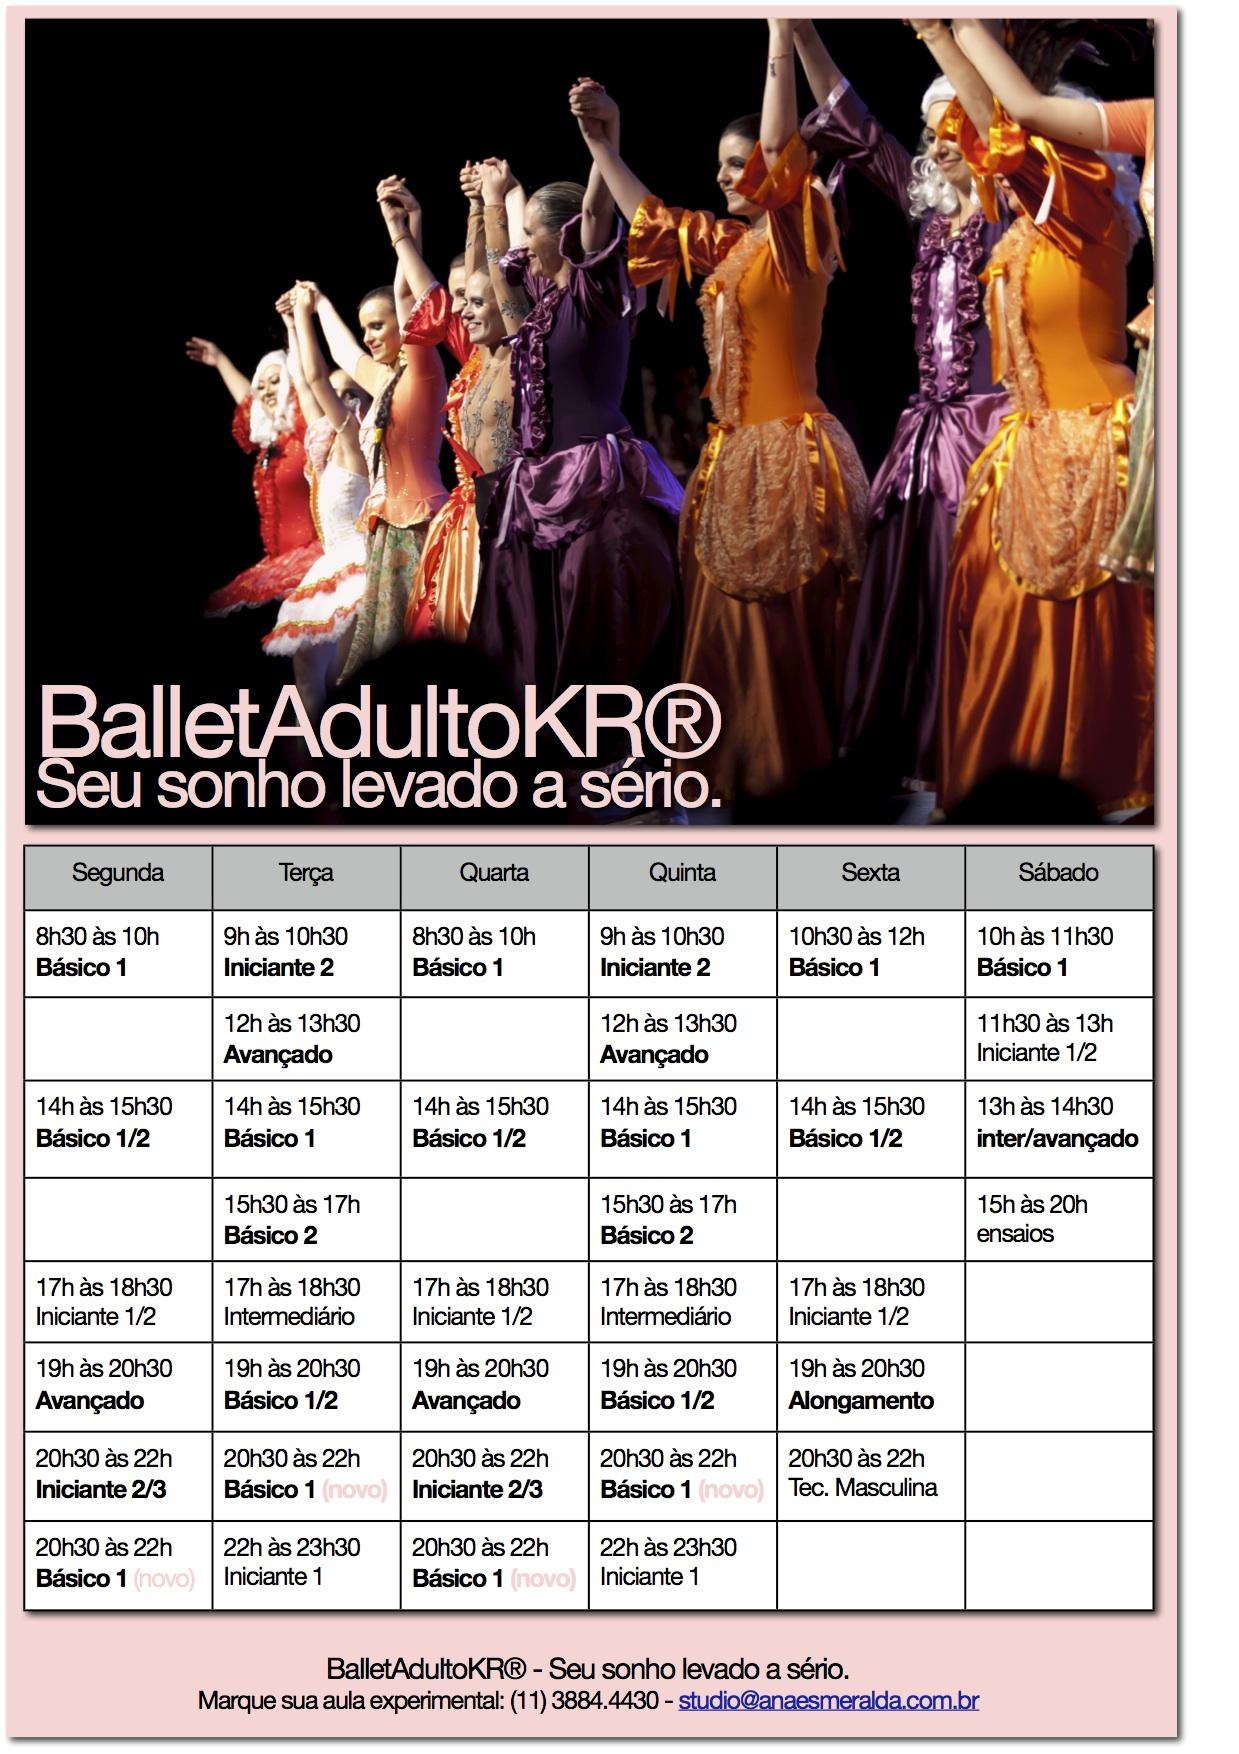 Grade de horários de ballet clássico para adultos - 2014